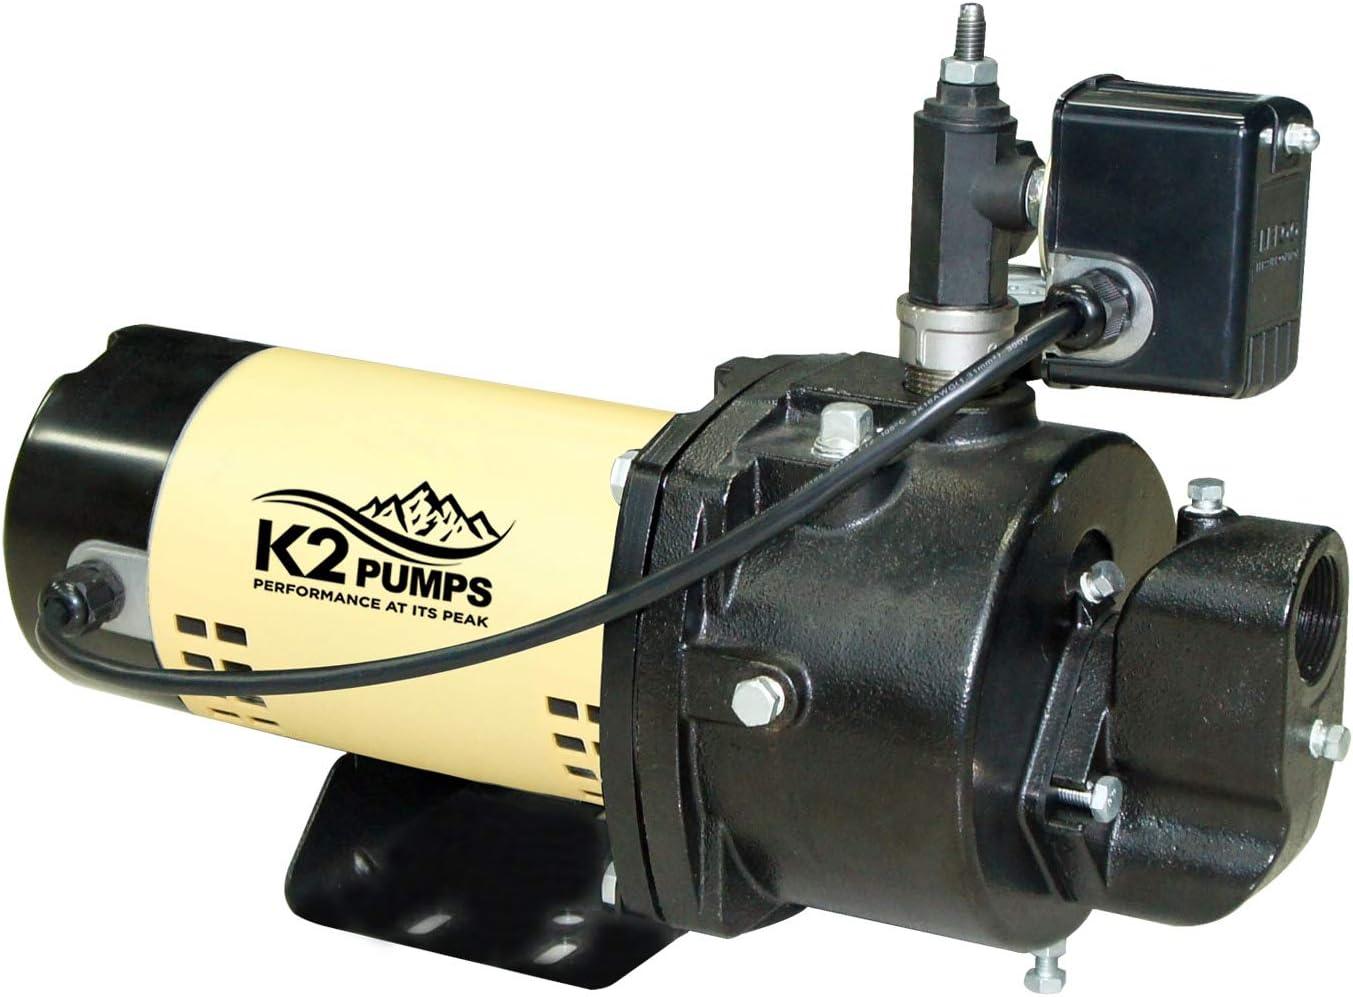 K2 Pumps WPD10001K 1 HP Convertible Pump Free shipping Iron Jet Time sale Cast